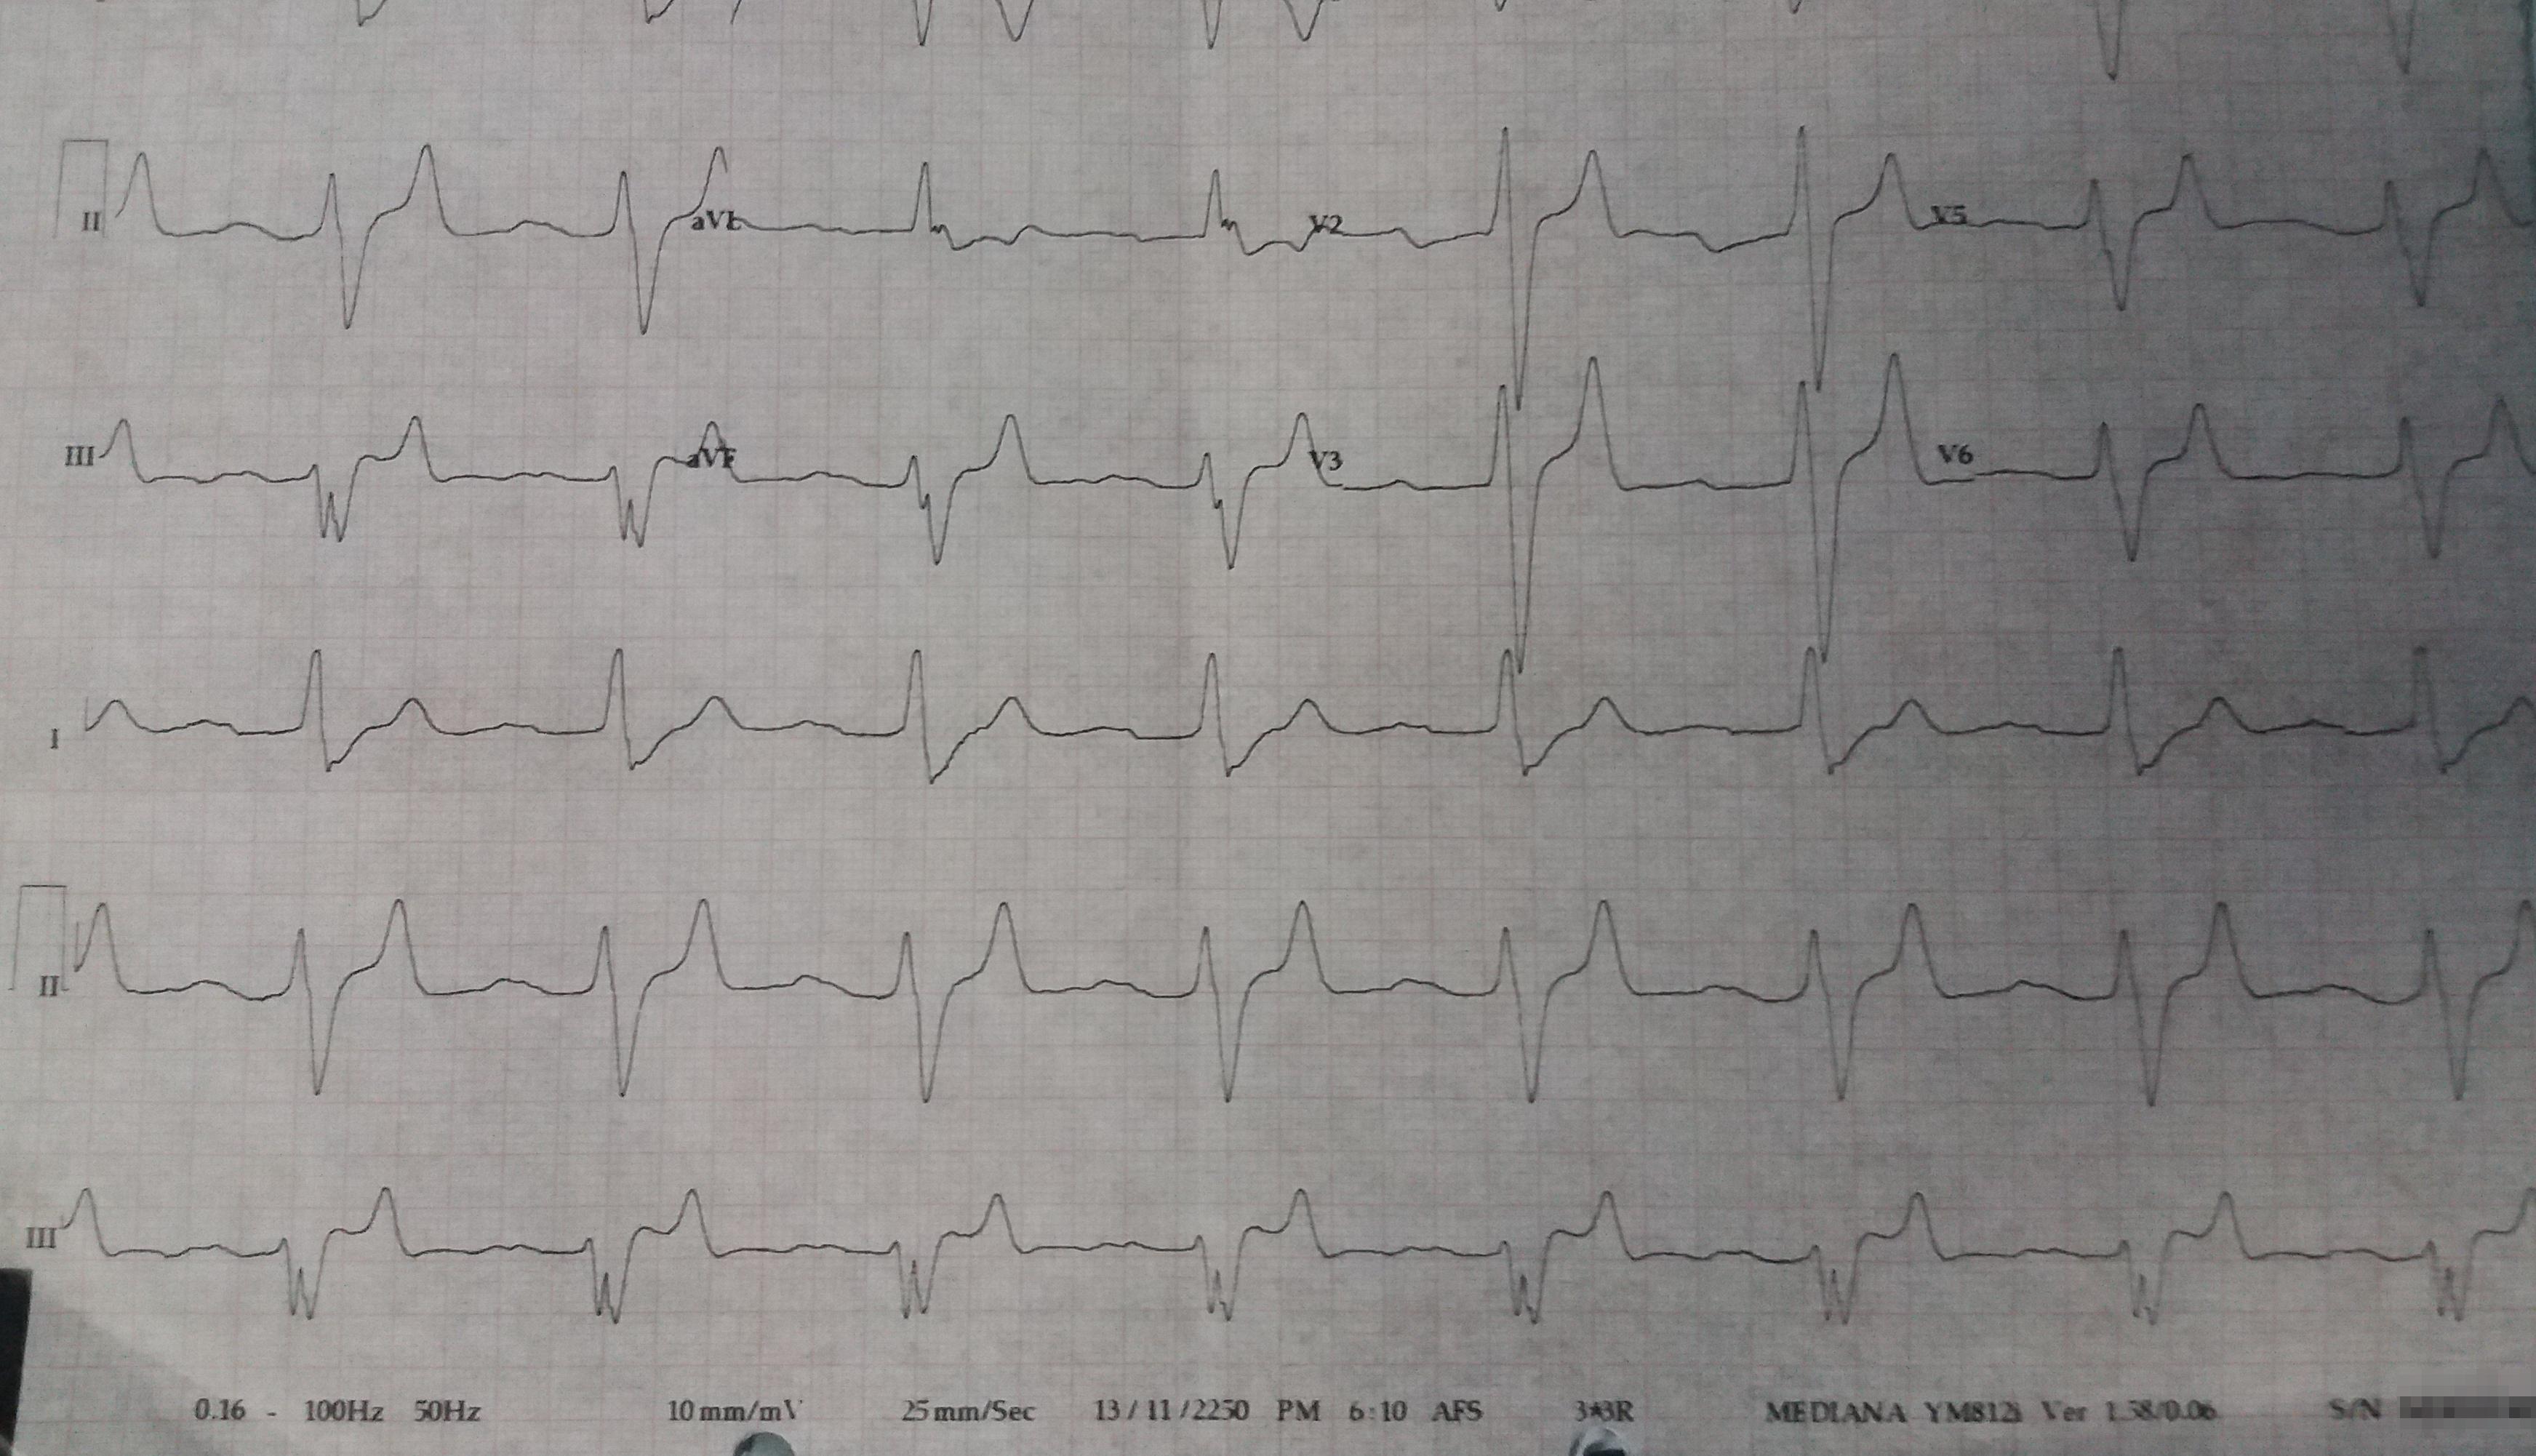 alt: Pre-Treatment ECG Data